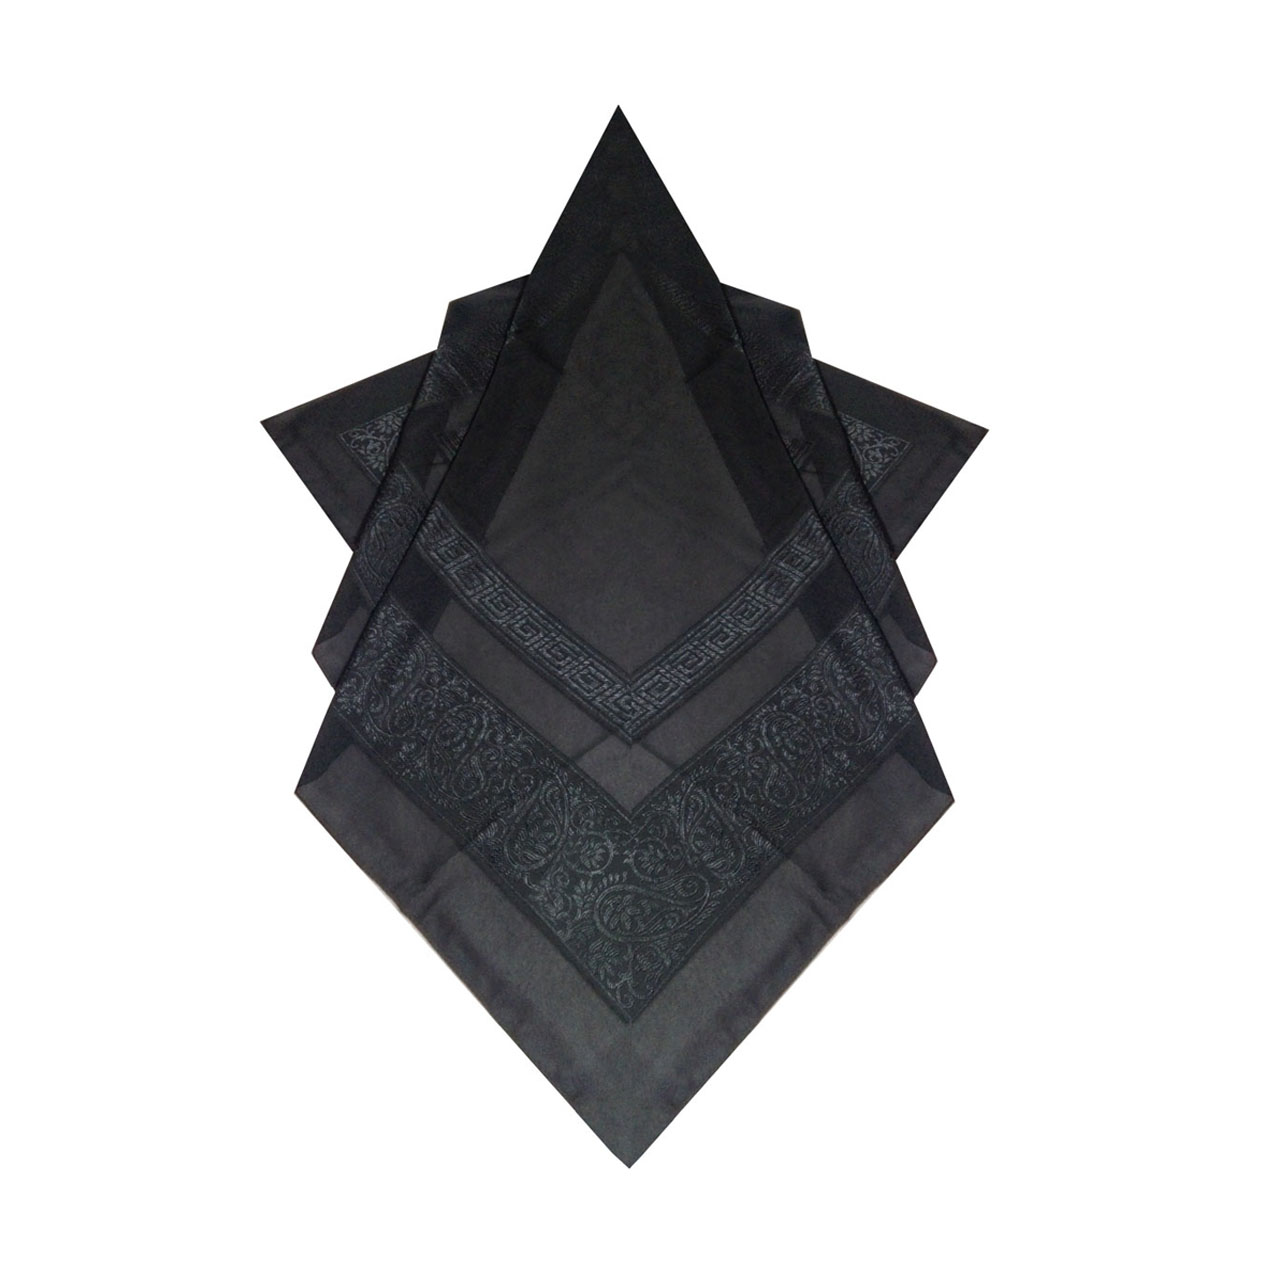 عکس روسری زنانه توتو طرح گل برجسته 01